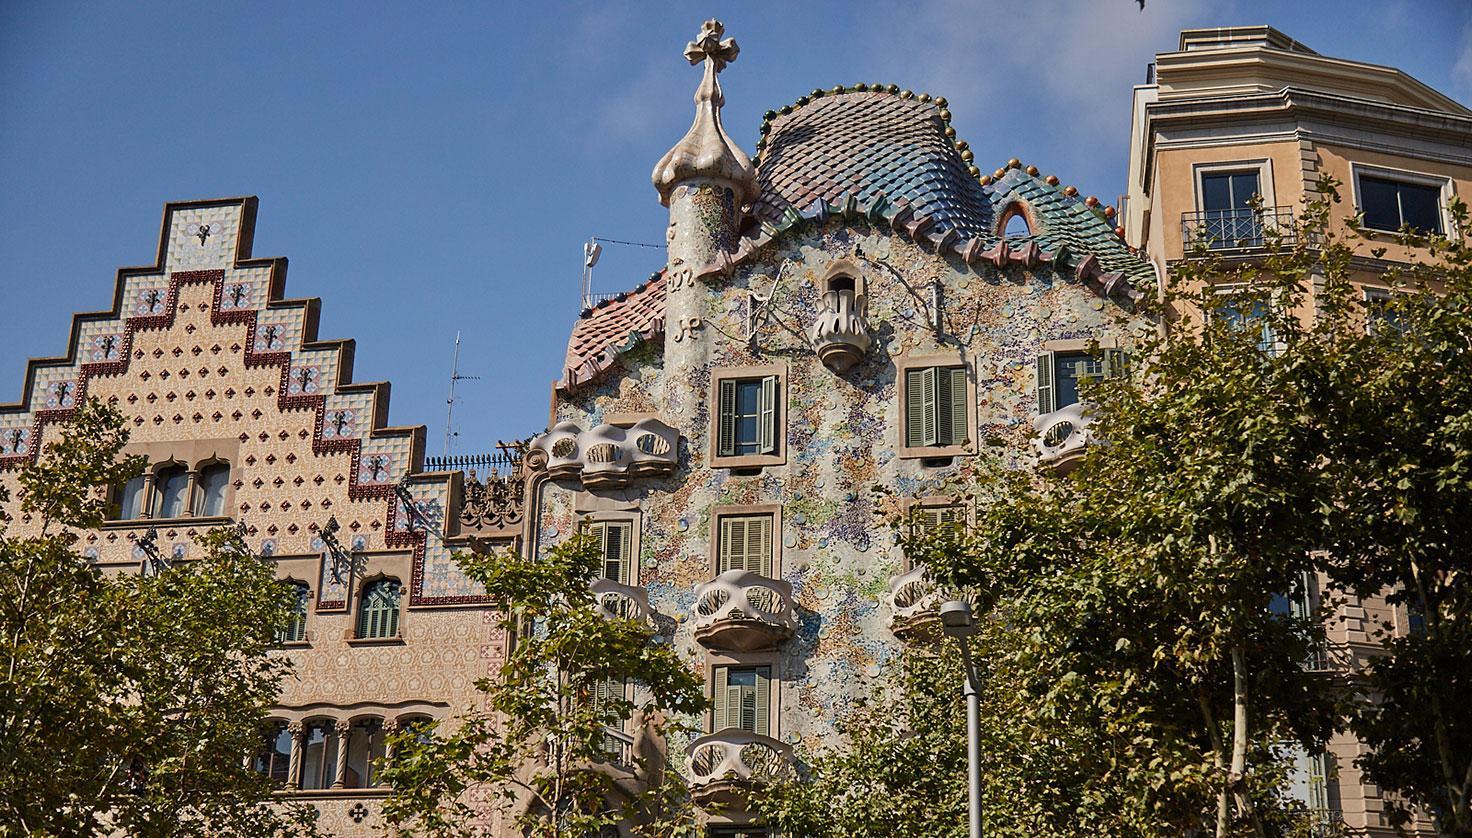 Foto Casa Batlló Gaudí